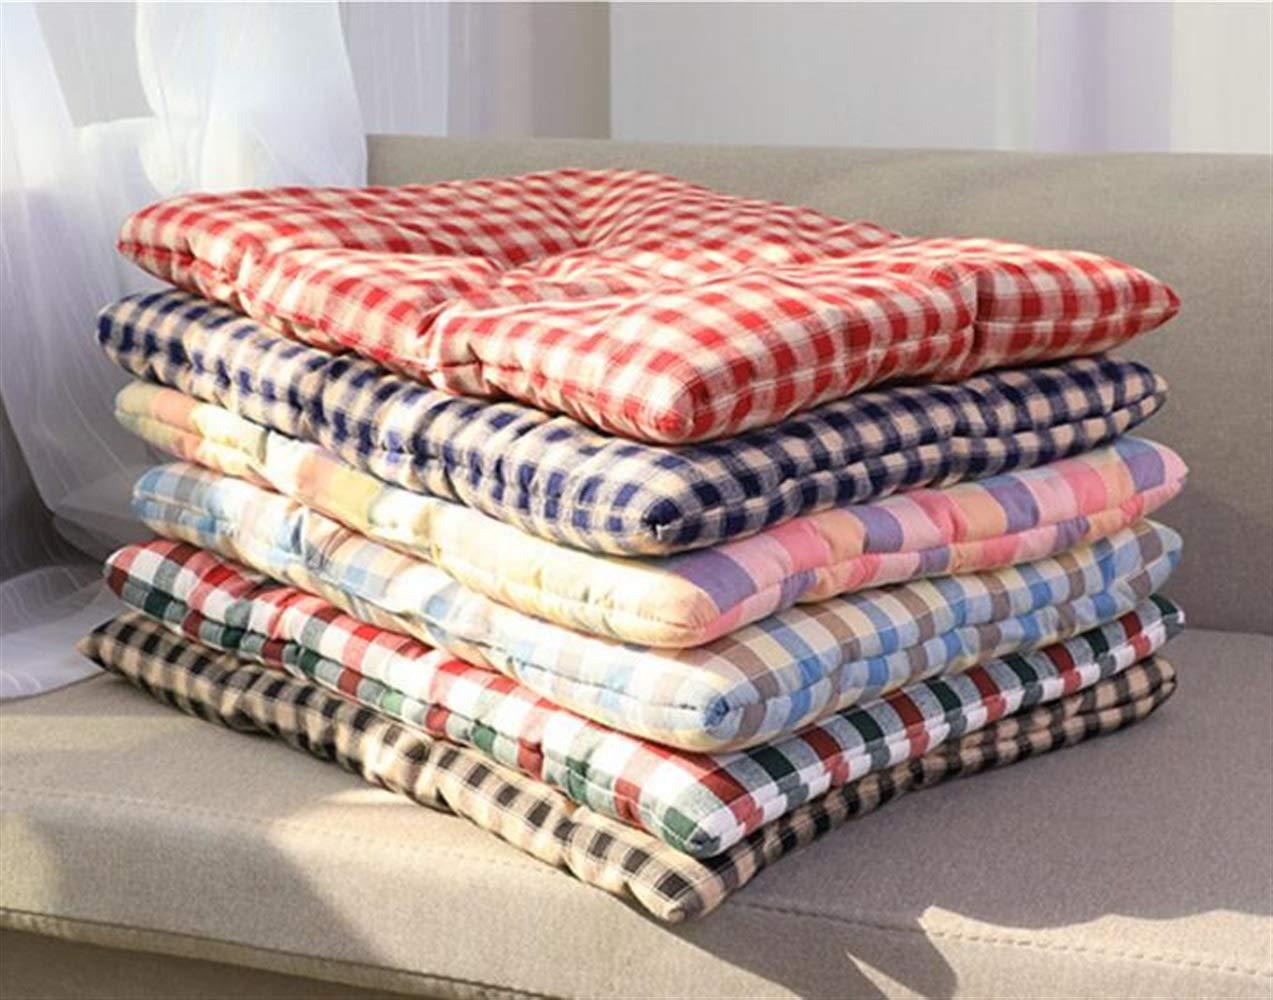 Amazon.com : Showking Pet Soft Blanket Dog Blanket Pet ...